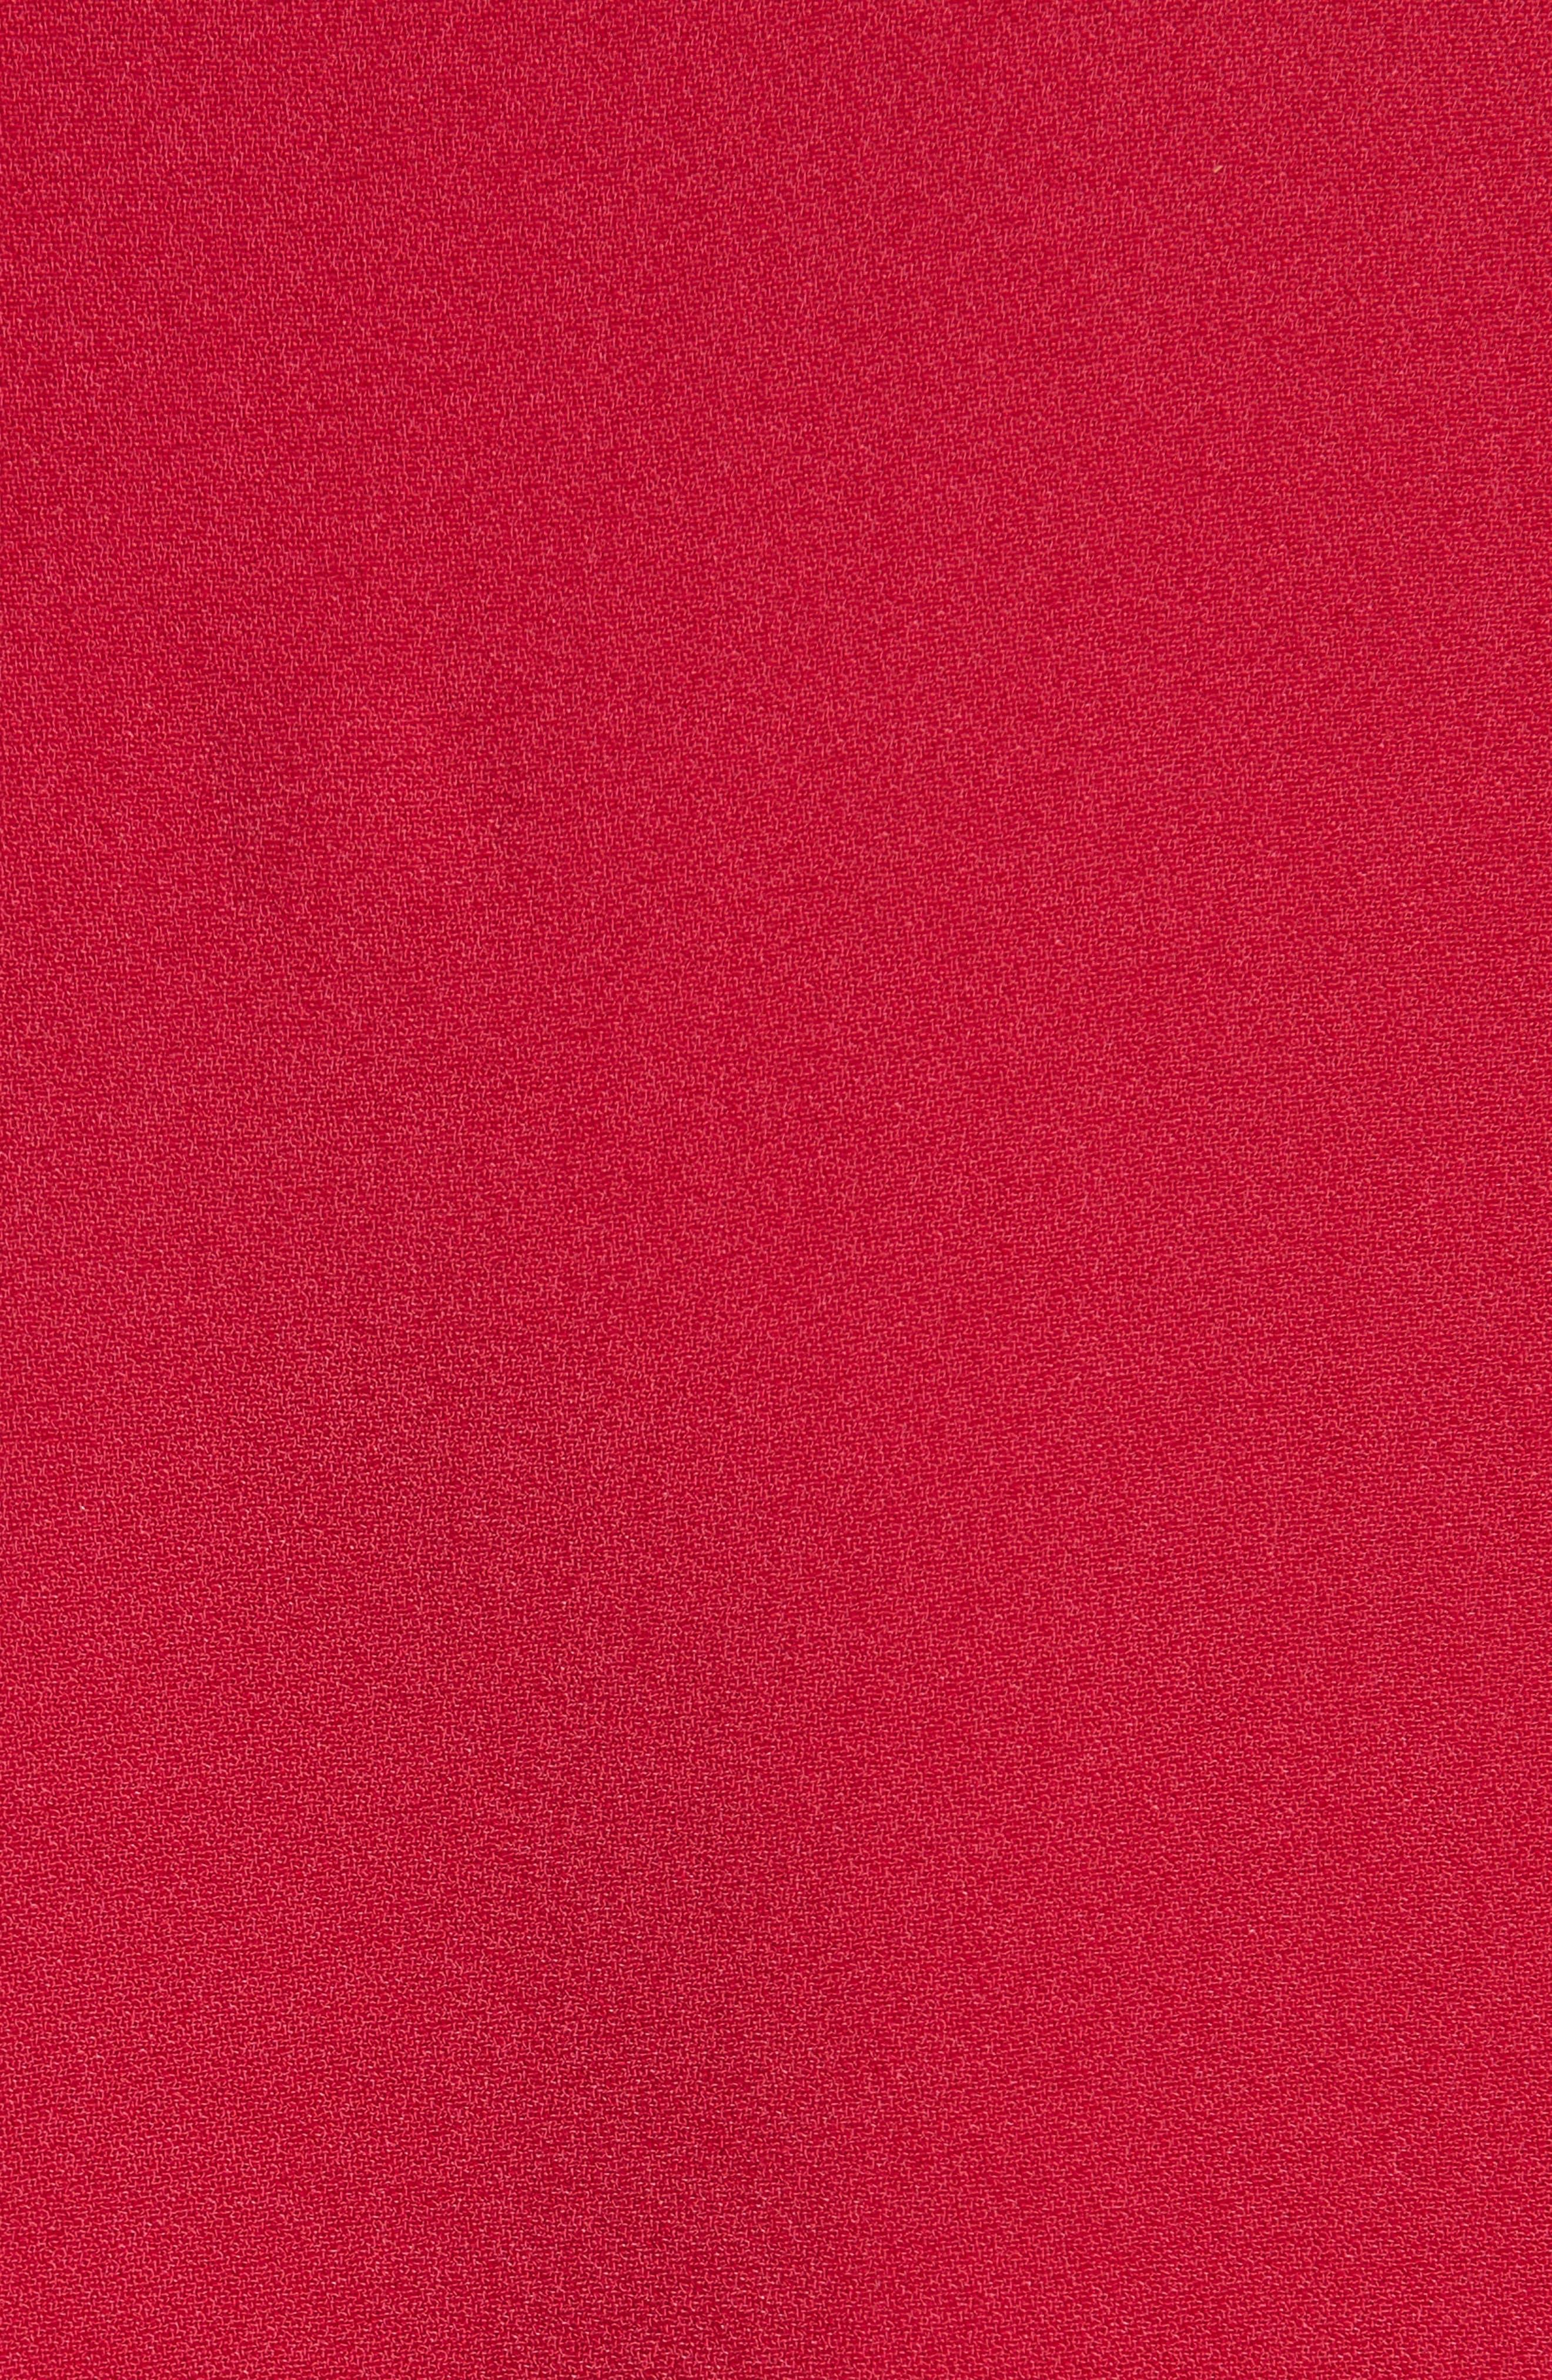 Ruffle Hem Top,                             Alternate thumbnail 3, color,                             Hot Pink